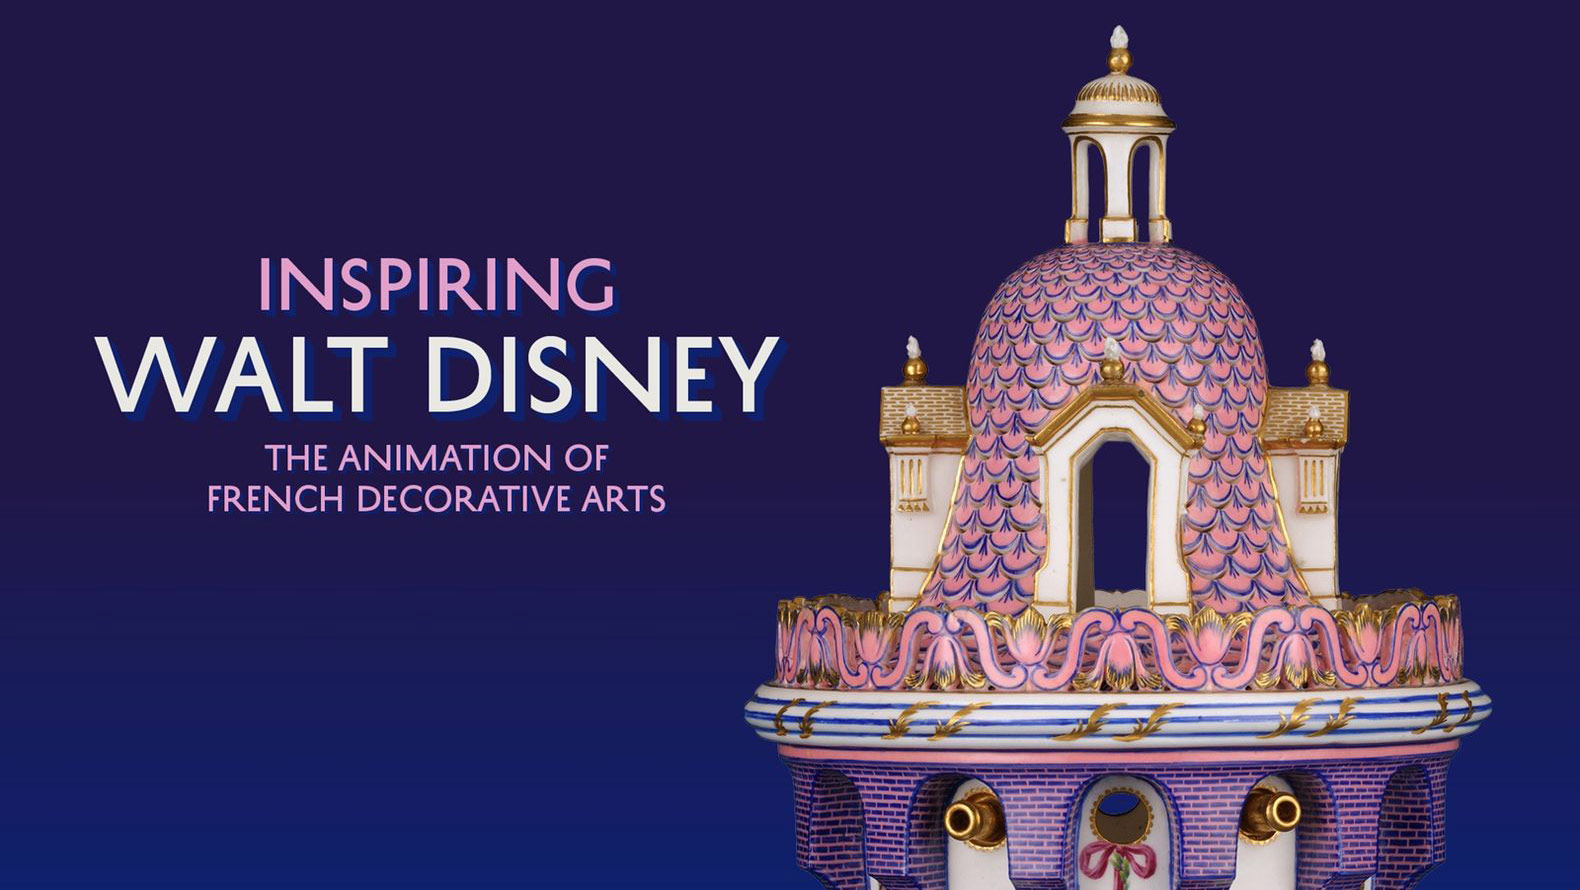 Inspiring Walt Disney: The Animation of French DecorativeArts